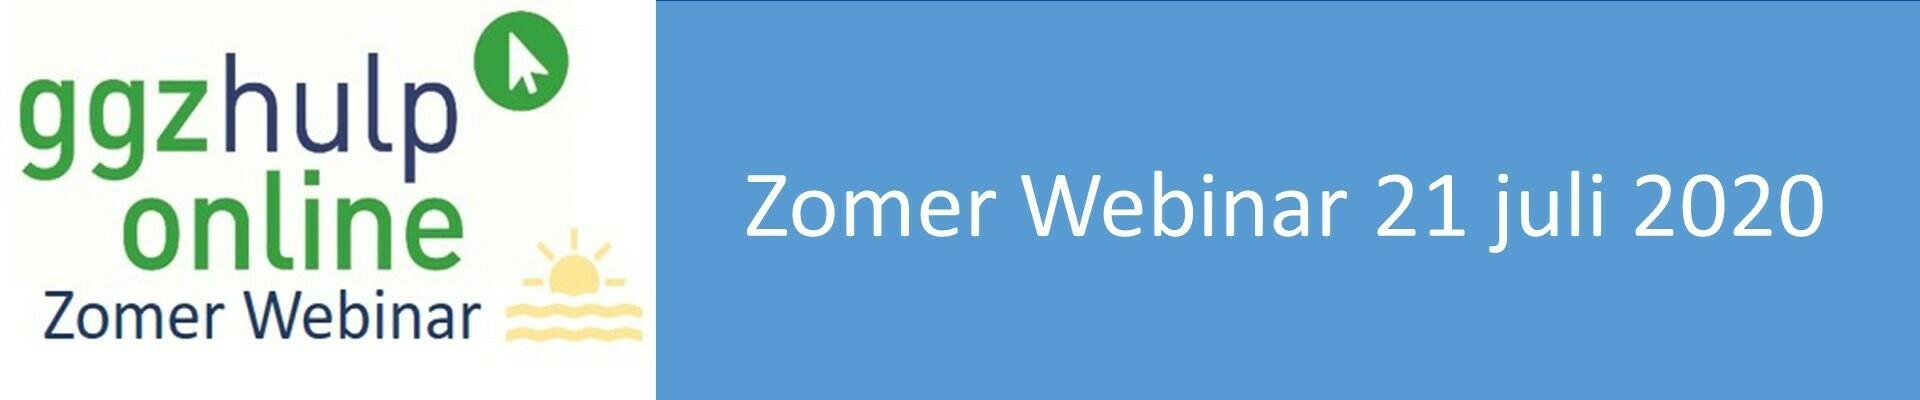 21-07-2020 Zomerwebinar ggzhulponline